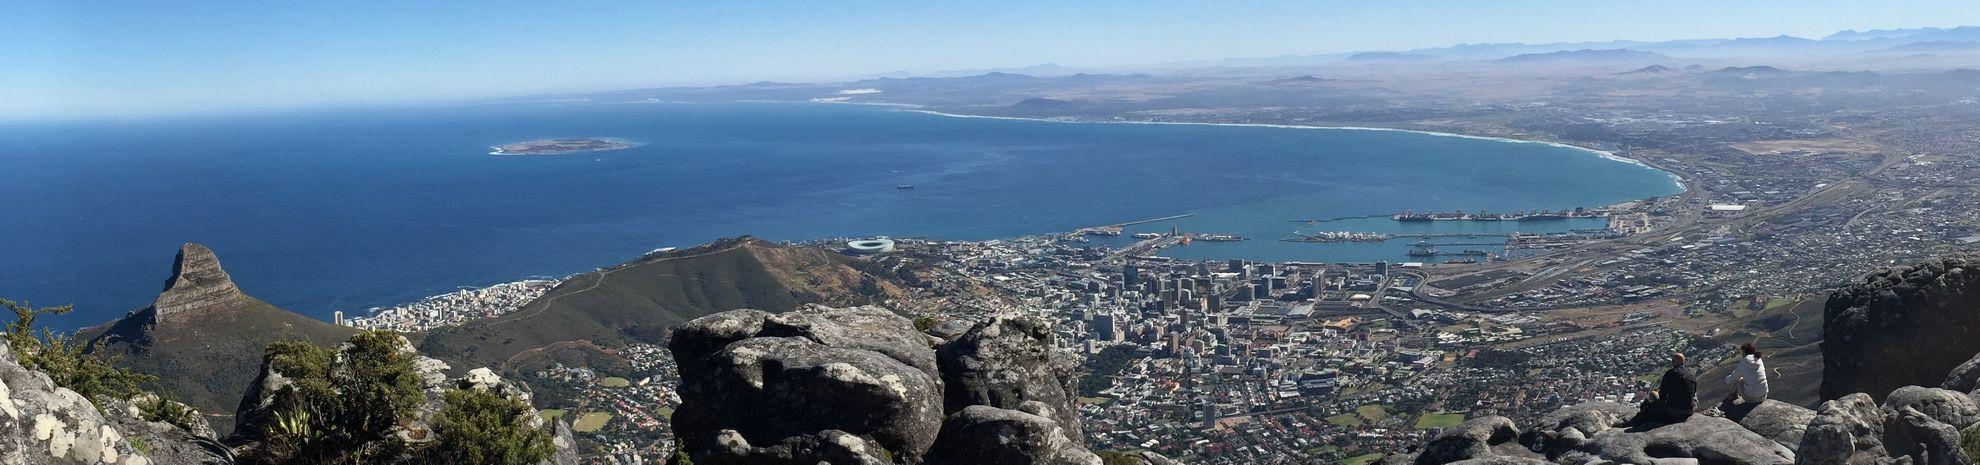 Südafrika Bilder 2017 - Südafrika 2017 | cbv.net